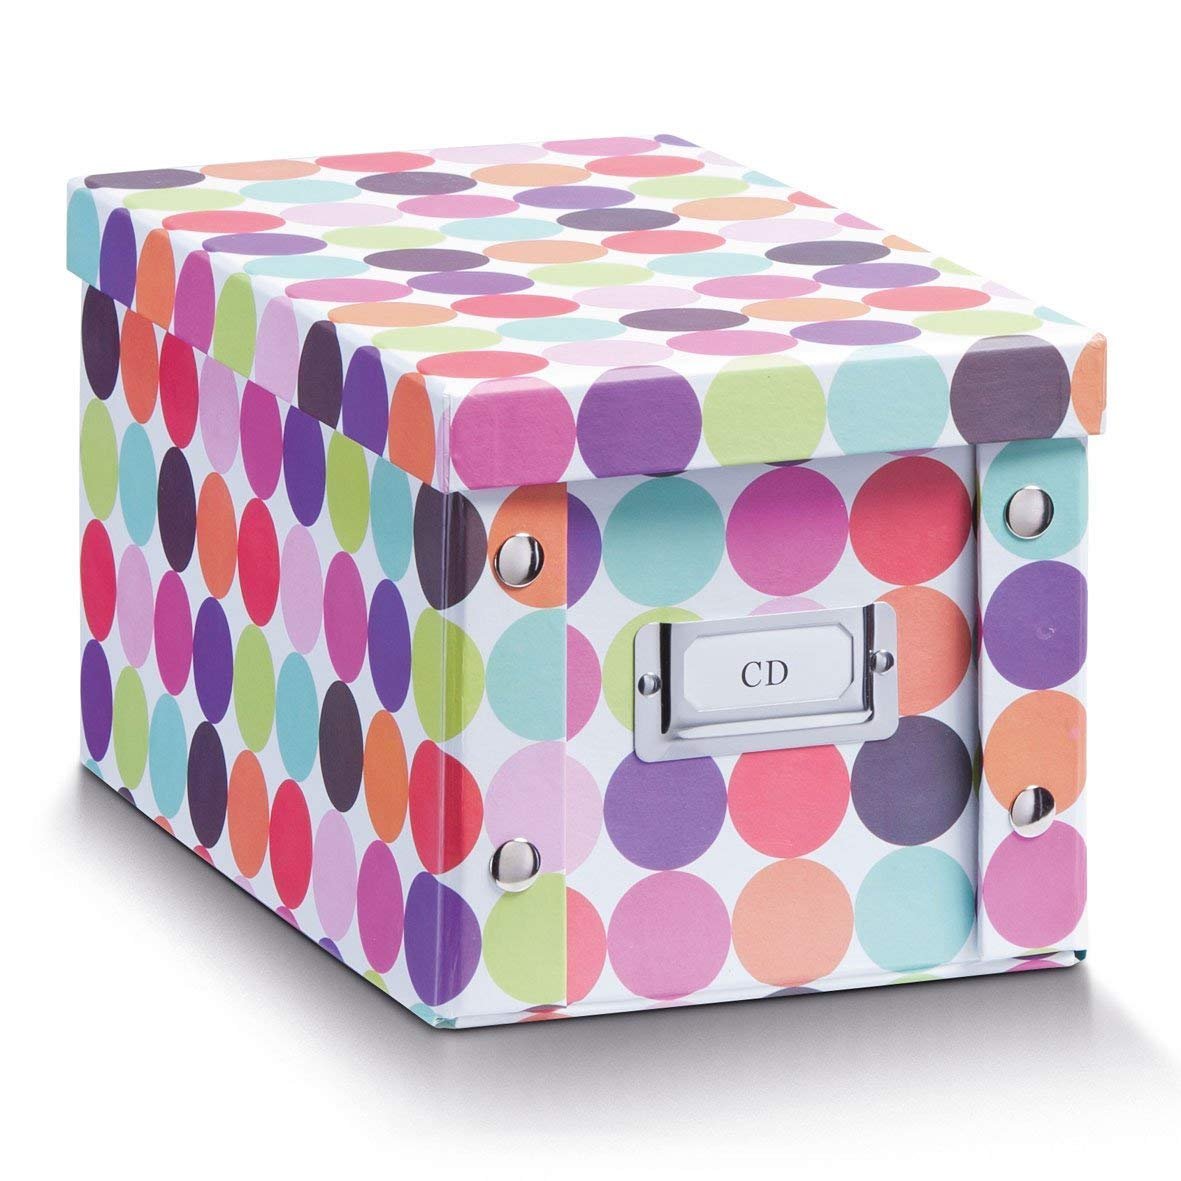 Wood Zeller Kids CD-Box Multi-Colour,16.5 X 28 X 15 Cm